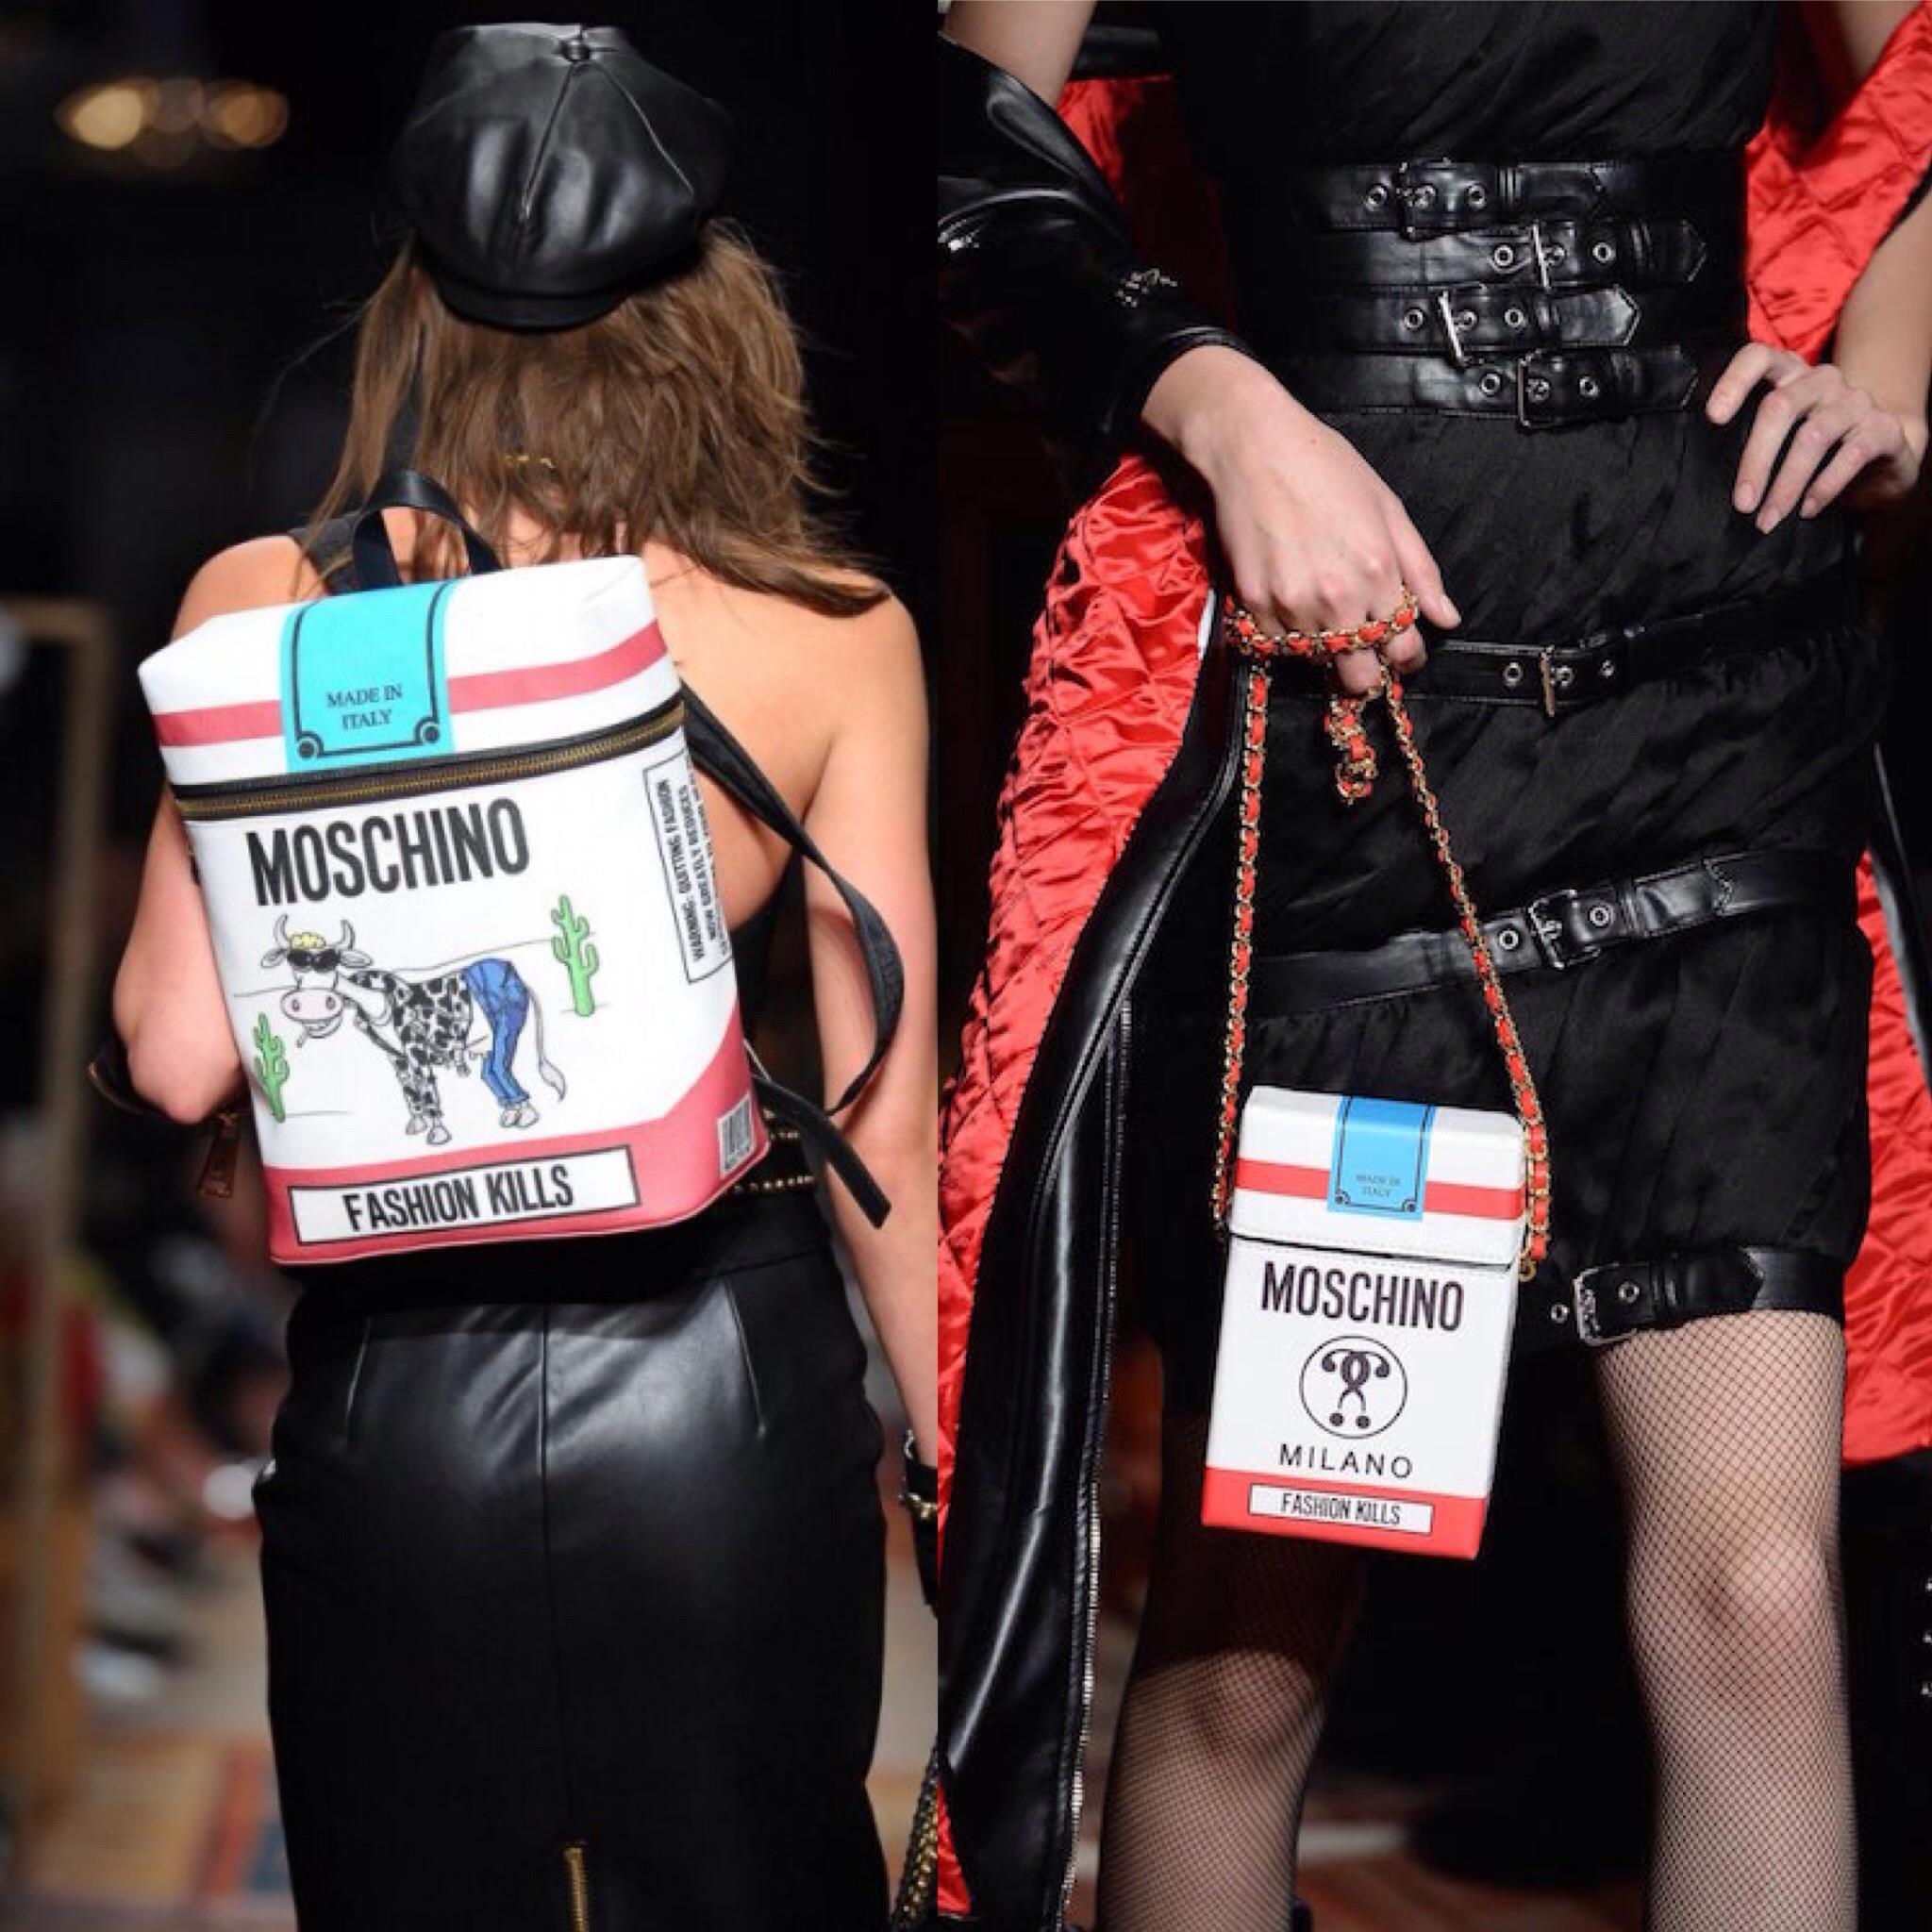 Fashion KILLS jeremy scott per Moschino fw2016